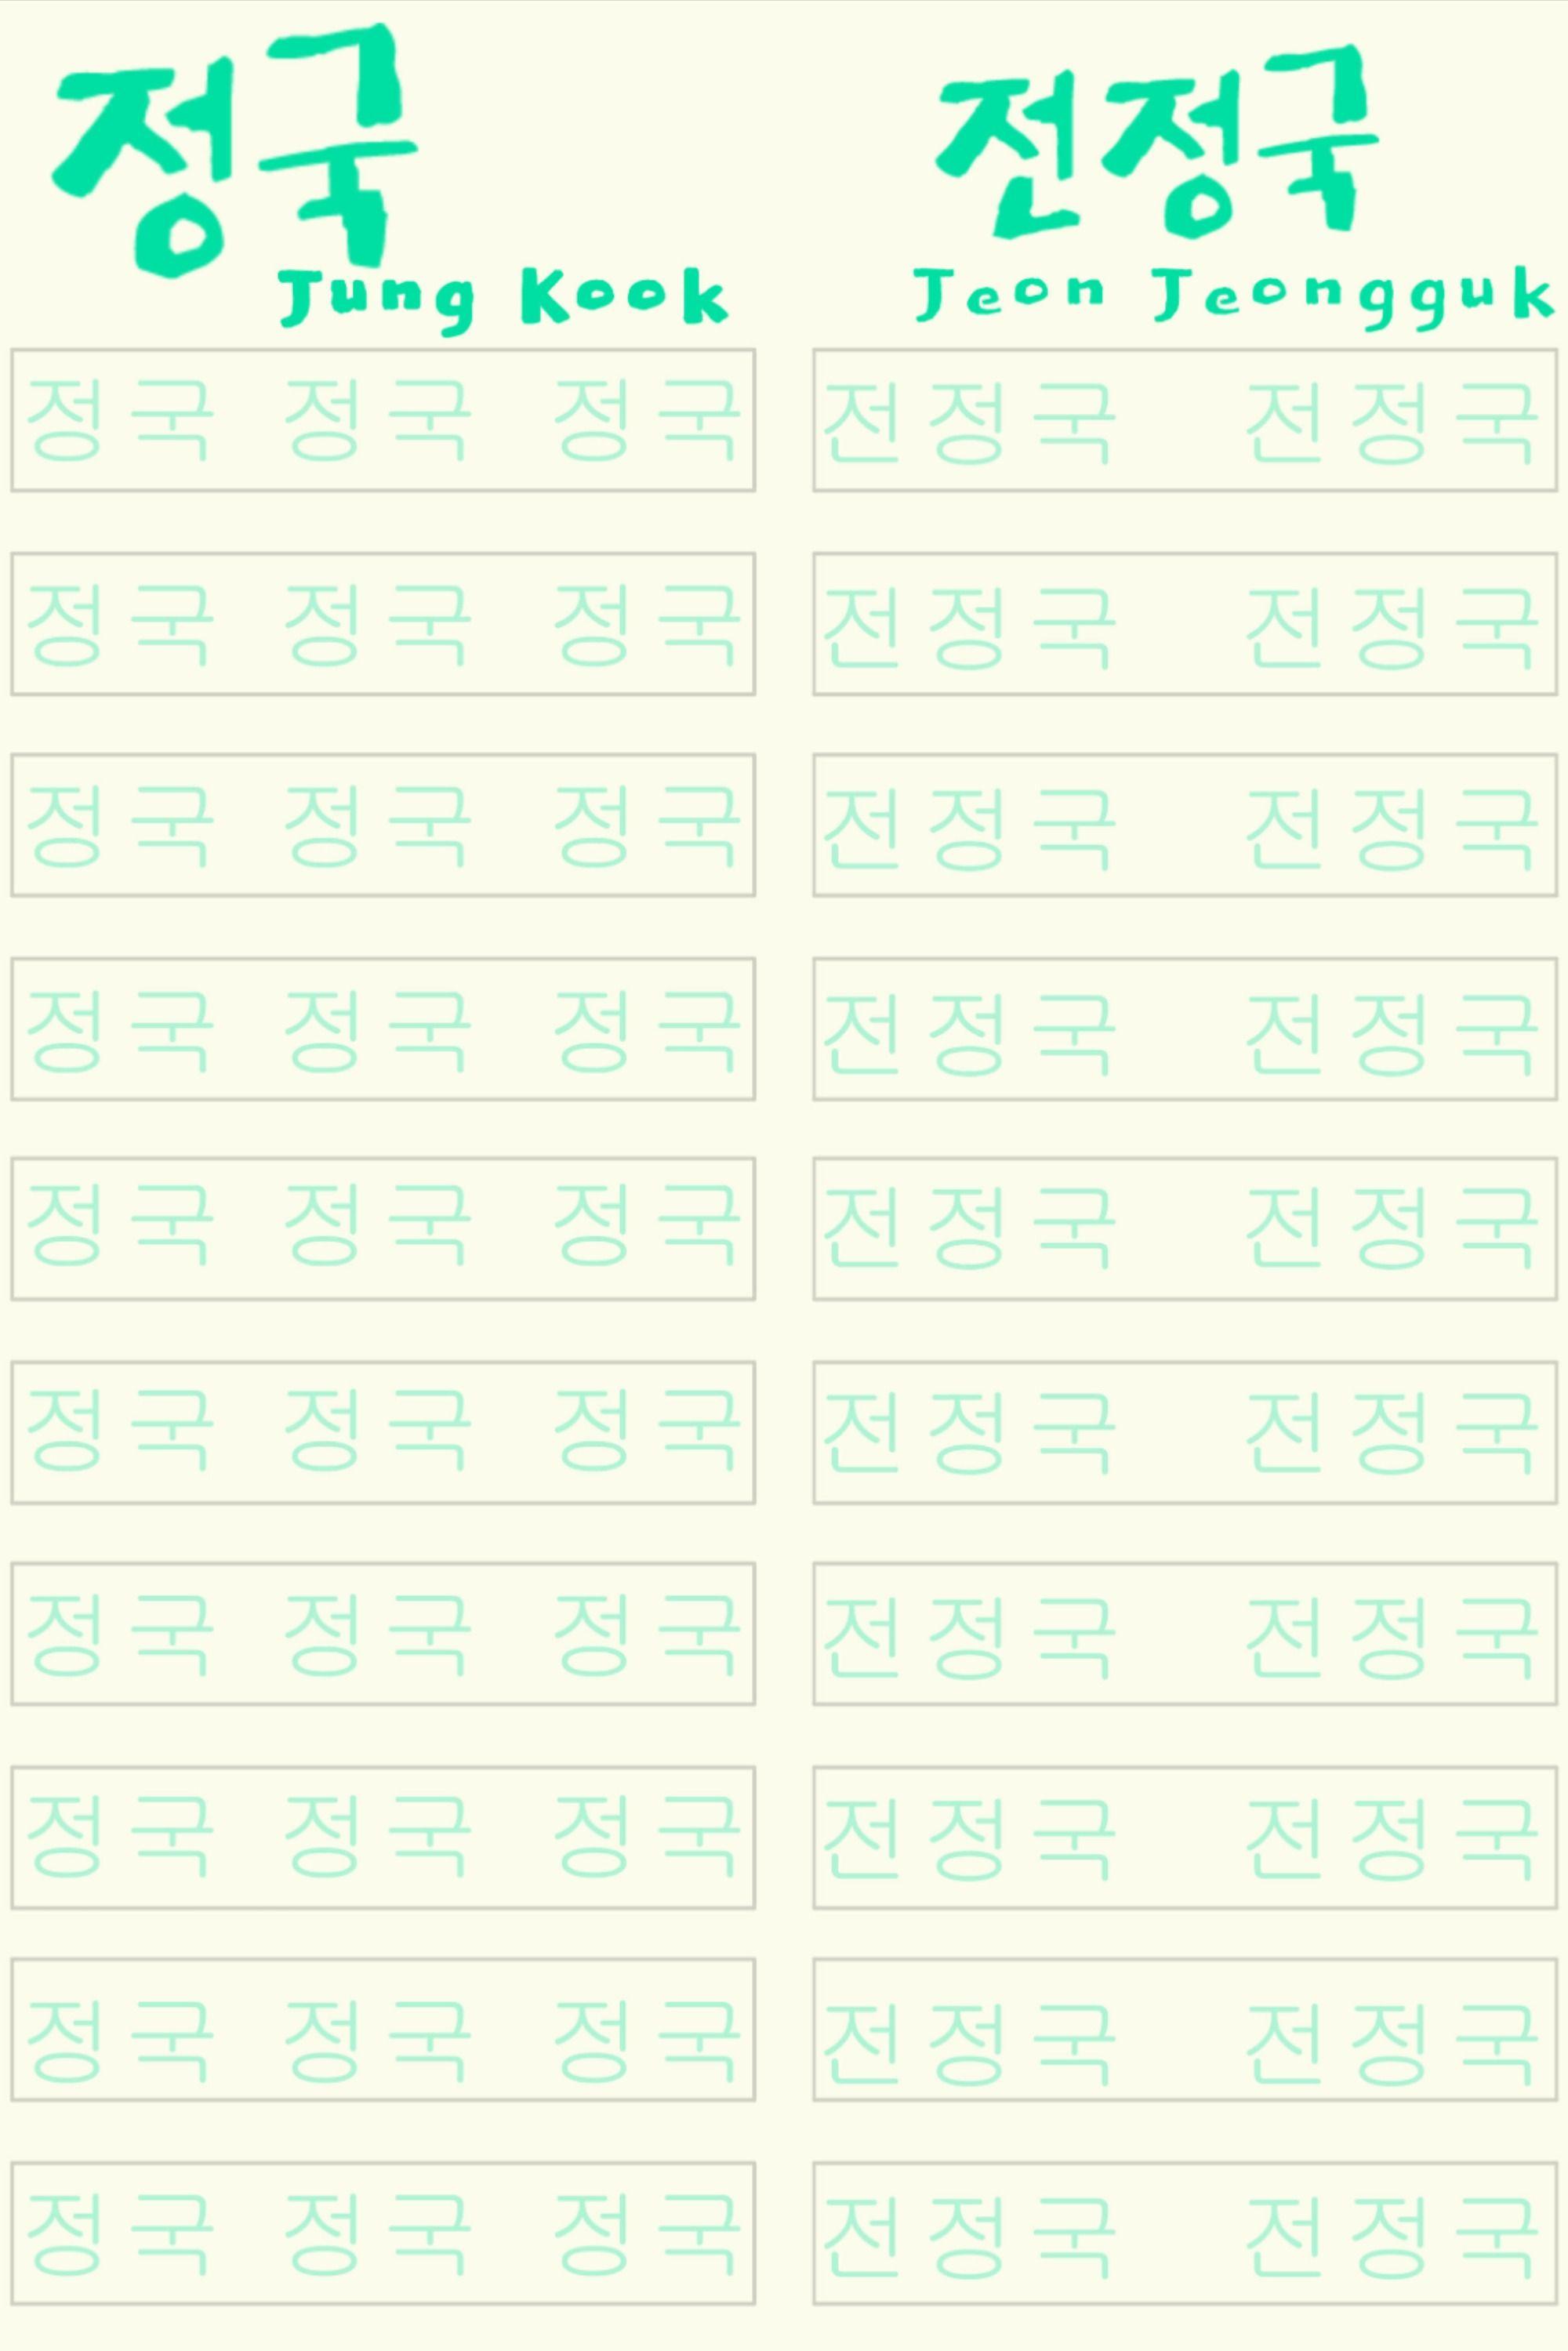 Bts Member Names Korean Language Practice Worksheet Printable S Note Good Note Language Study Learn Korean Hangul Letters Practise Korean Language Learn Korean Korean Language Learning Hangul writing practice sheets